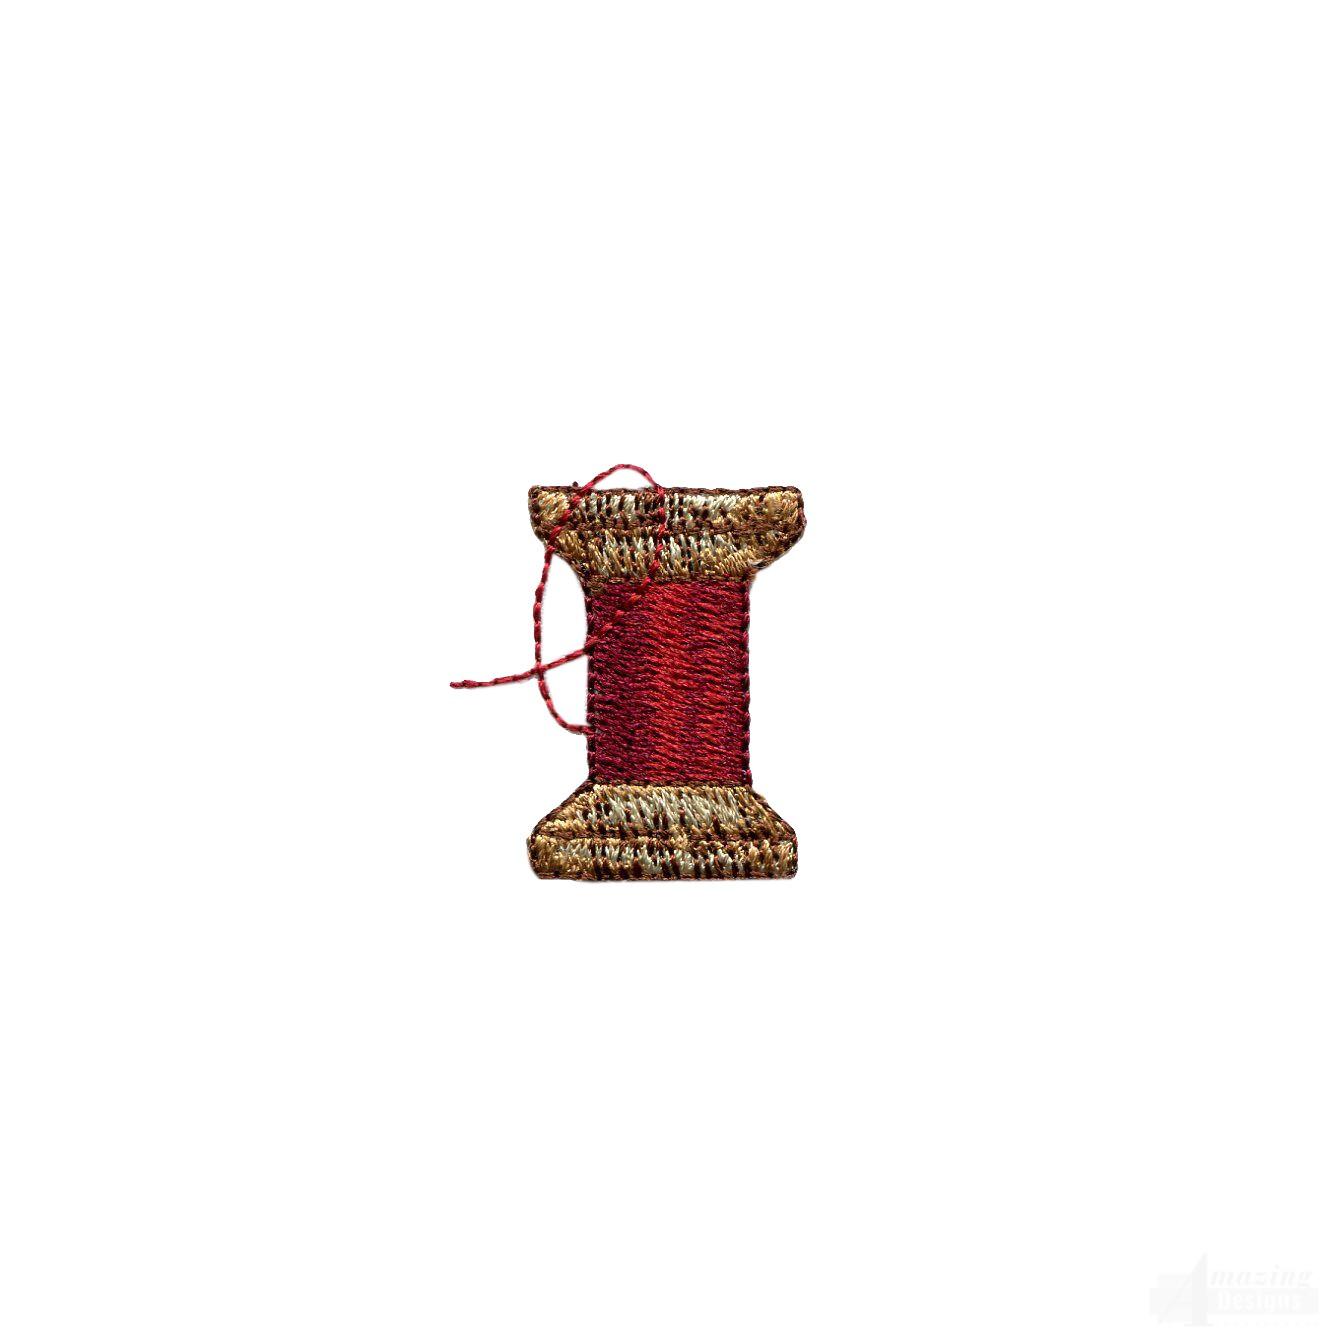 Sew thread spool embroidery design